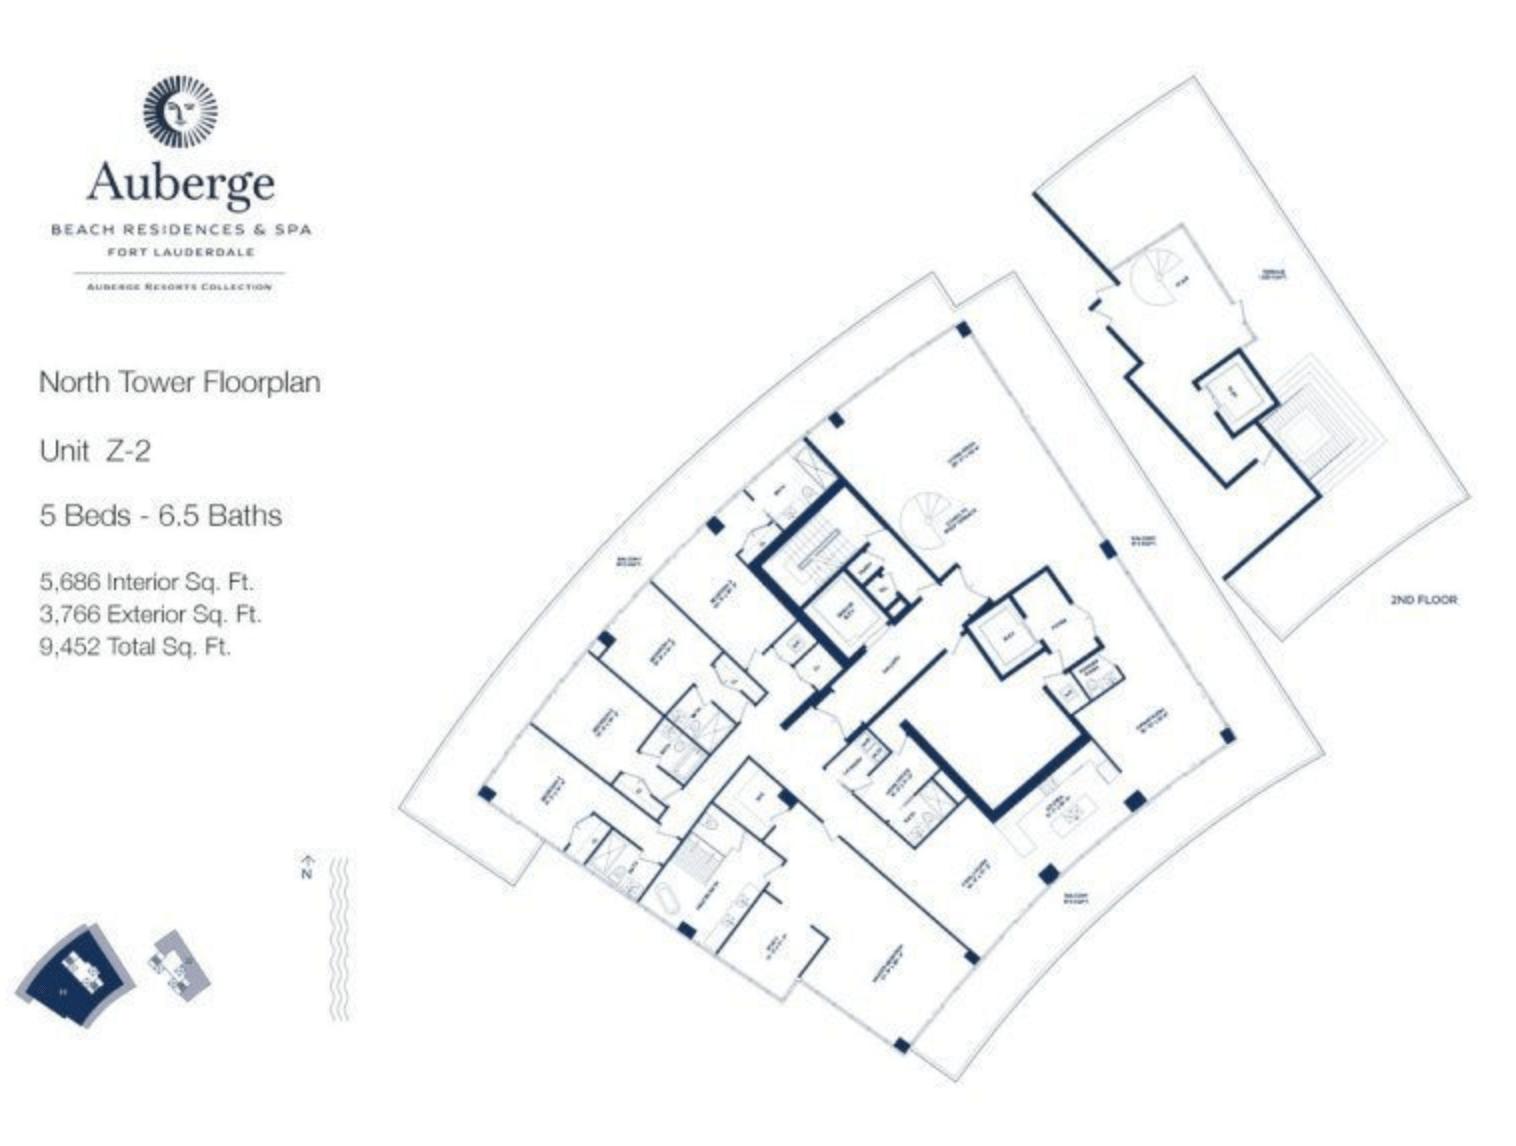 Auberge Beach Residences North Tower Z2 | 5 Beds - 6.5 baths